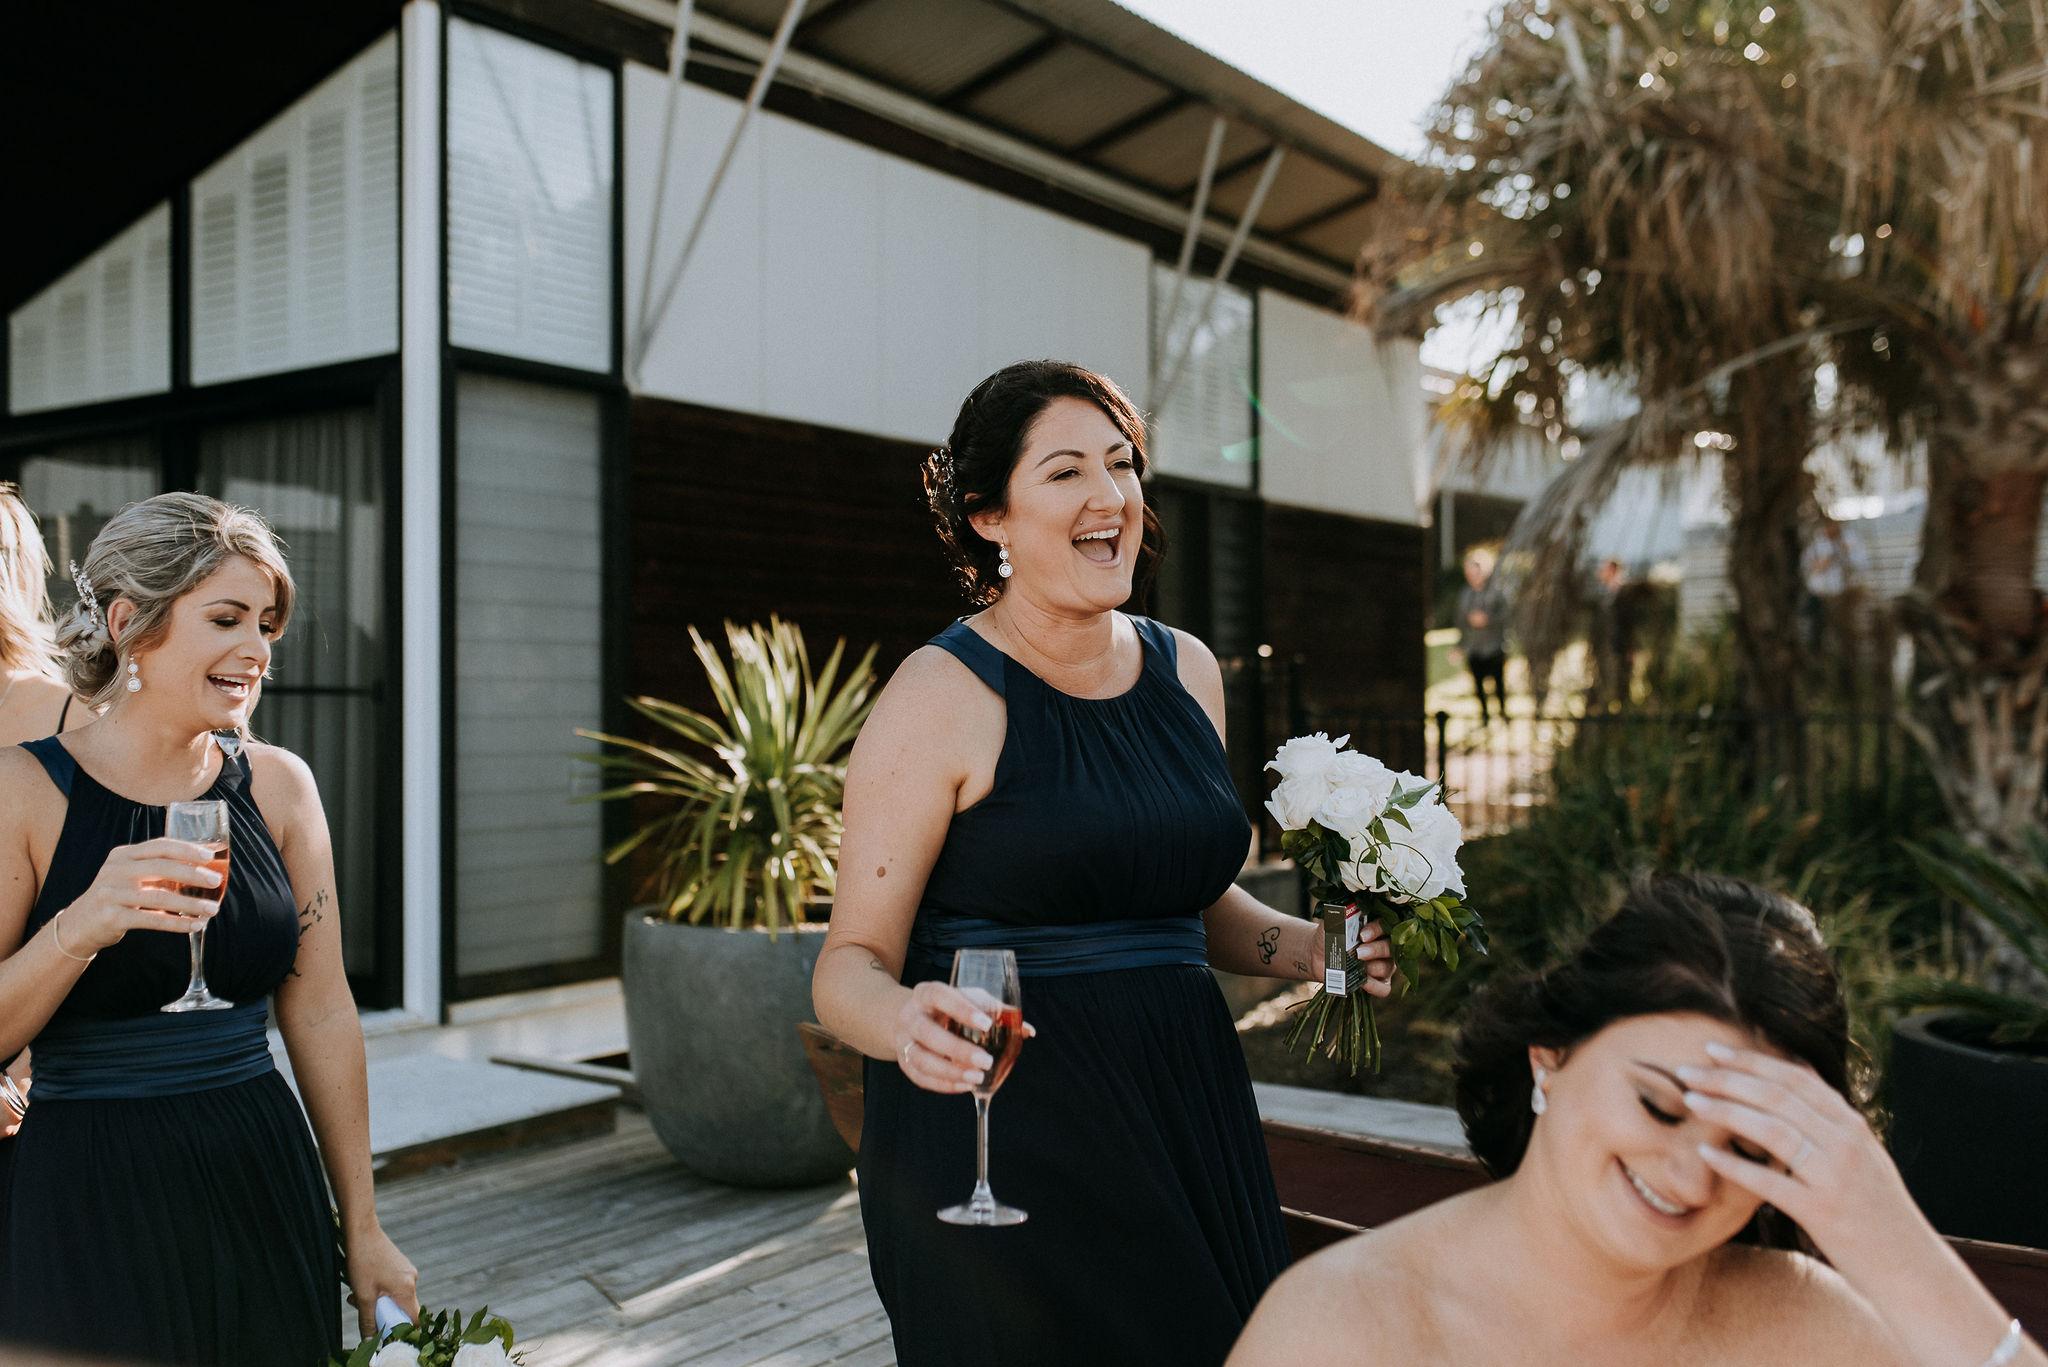 CAVES-BEACH-HOTEL-WEDDING-PATTEN-605.jpg